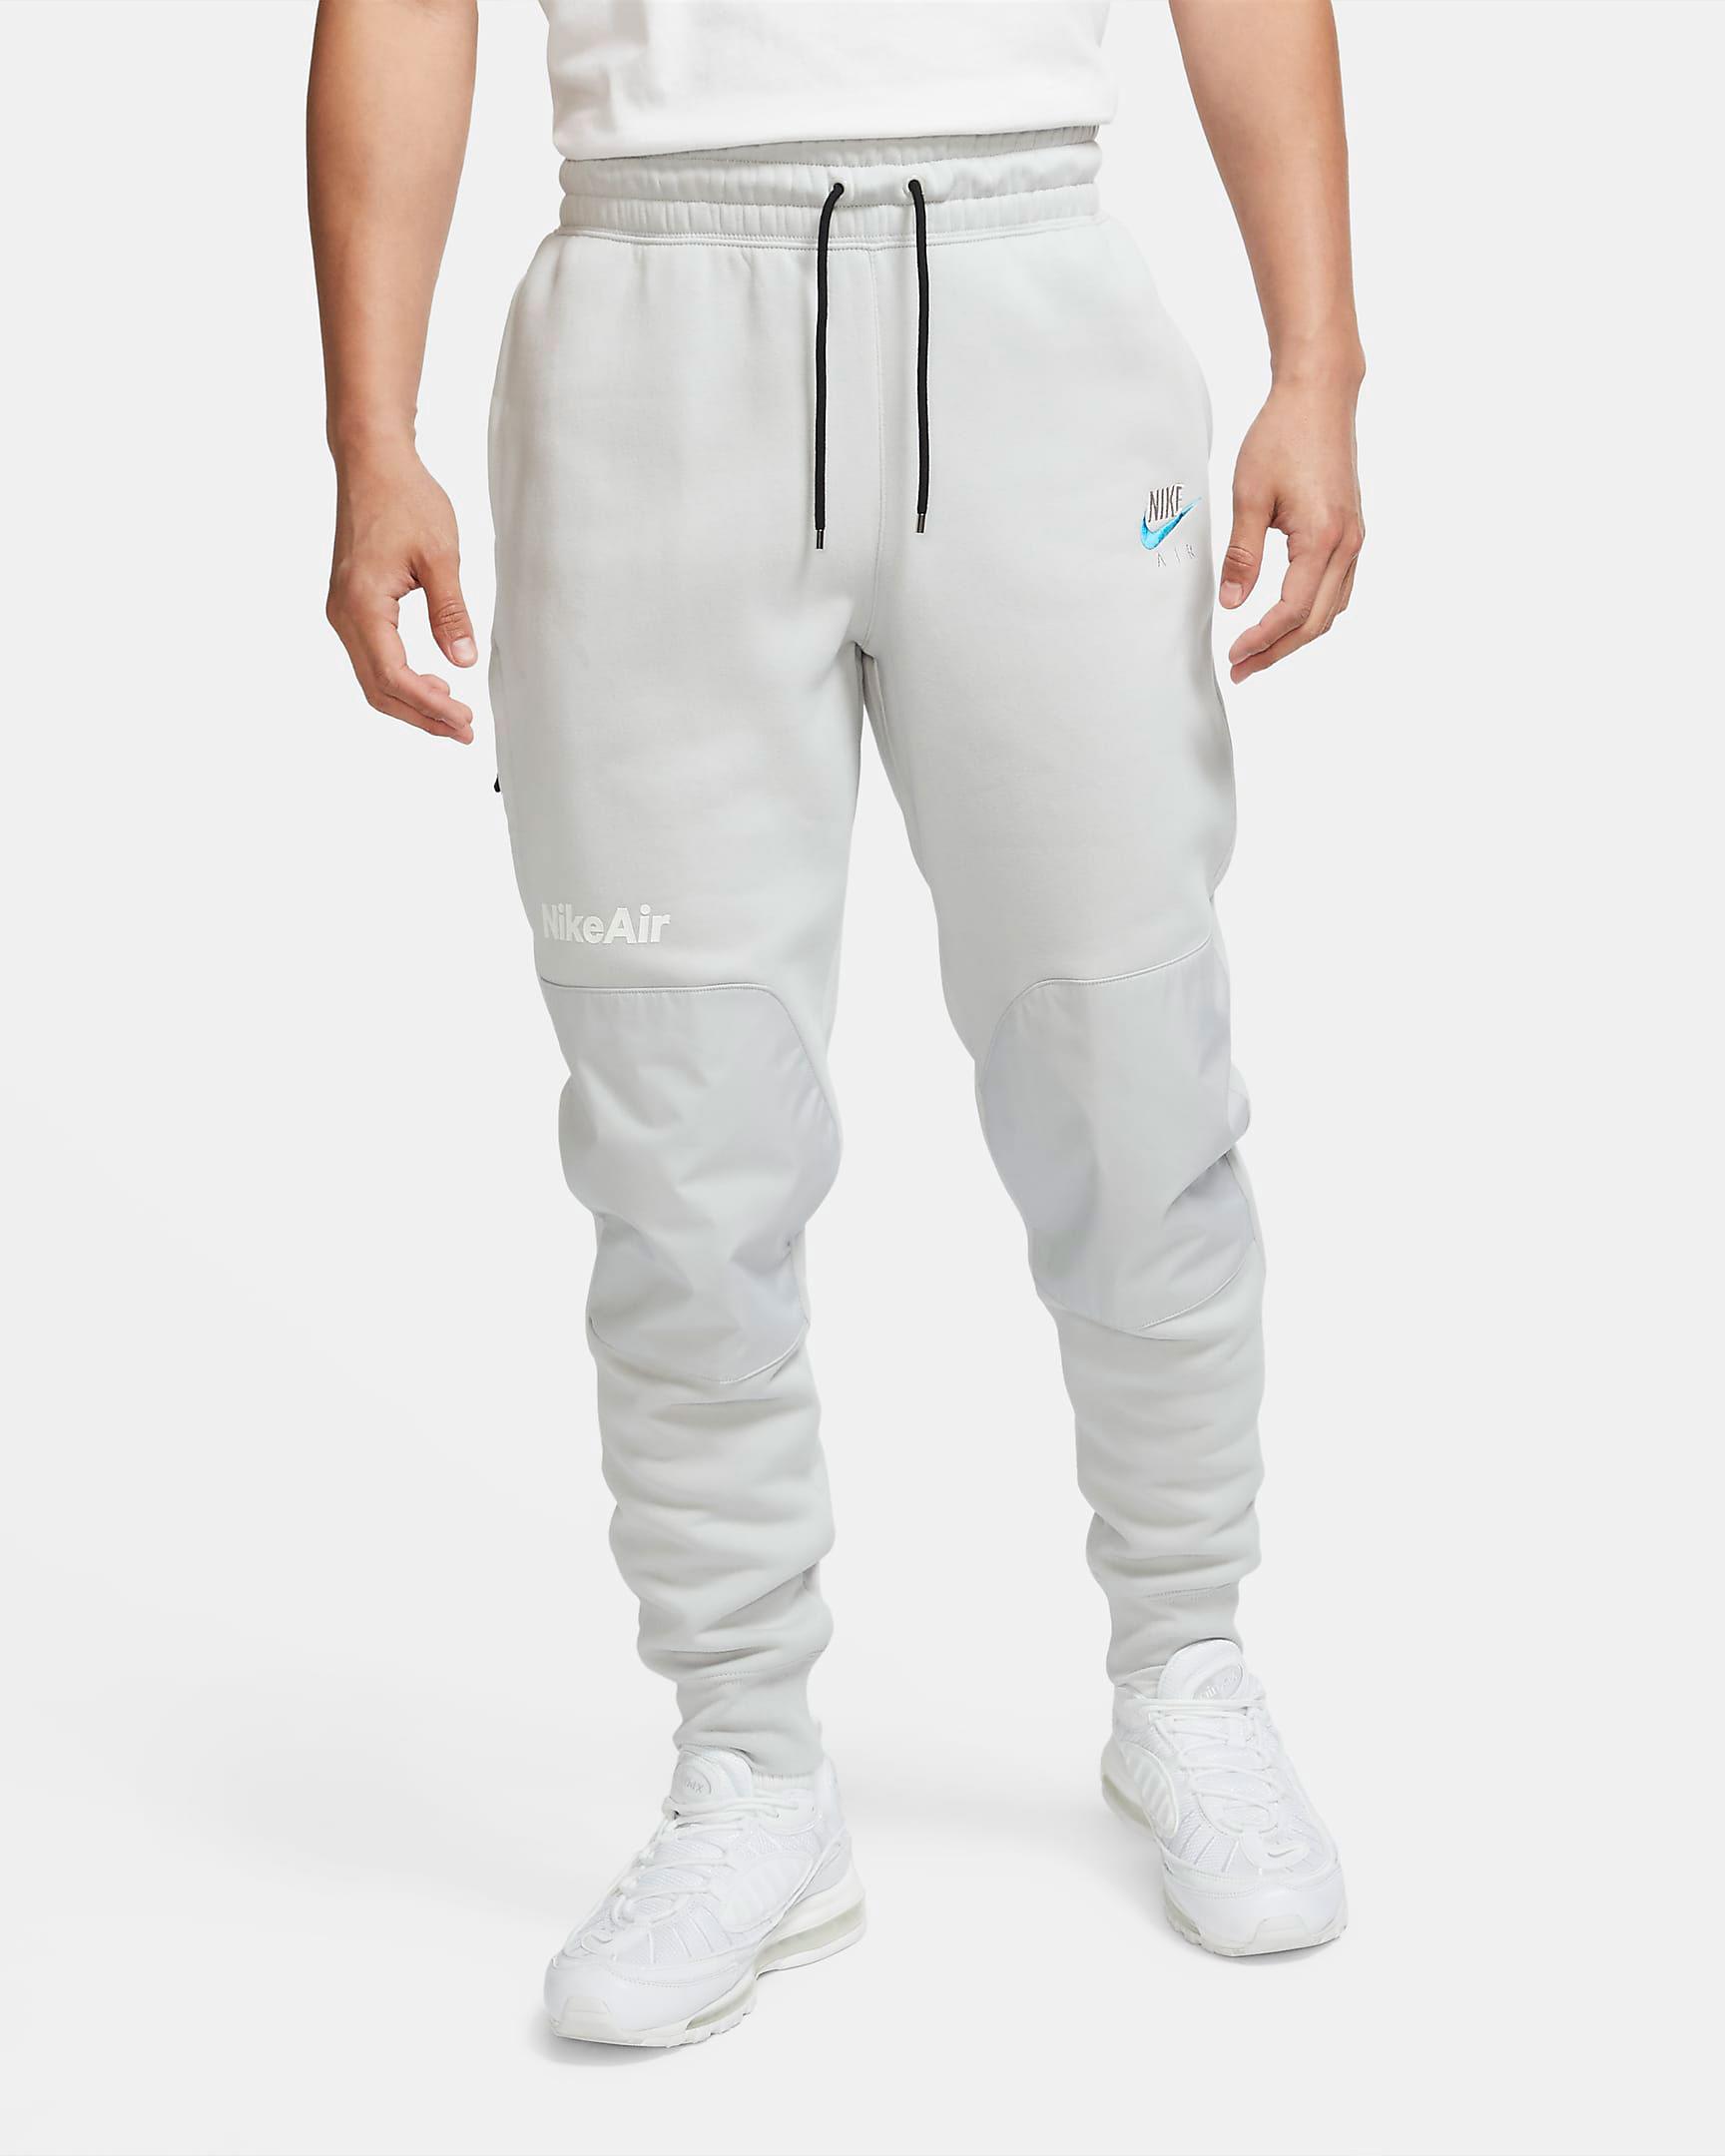 nike-air-fleece-pants-grey-fog-laser-blue